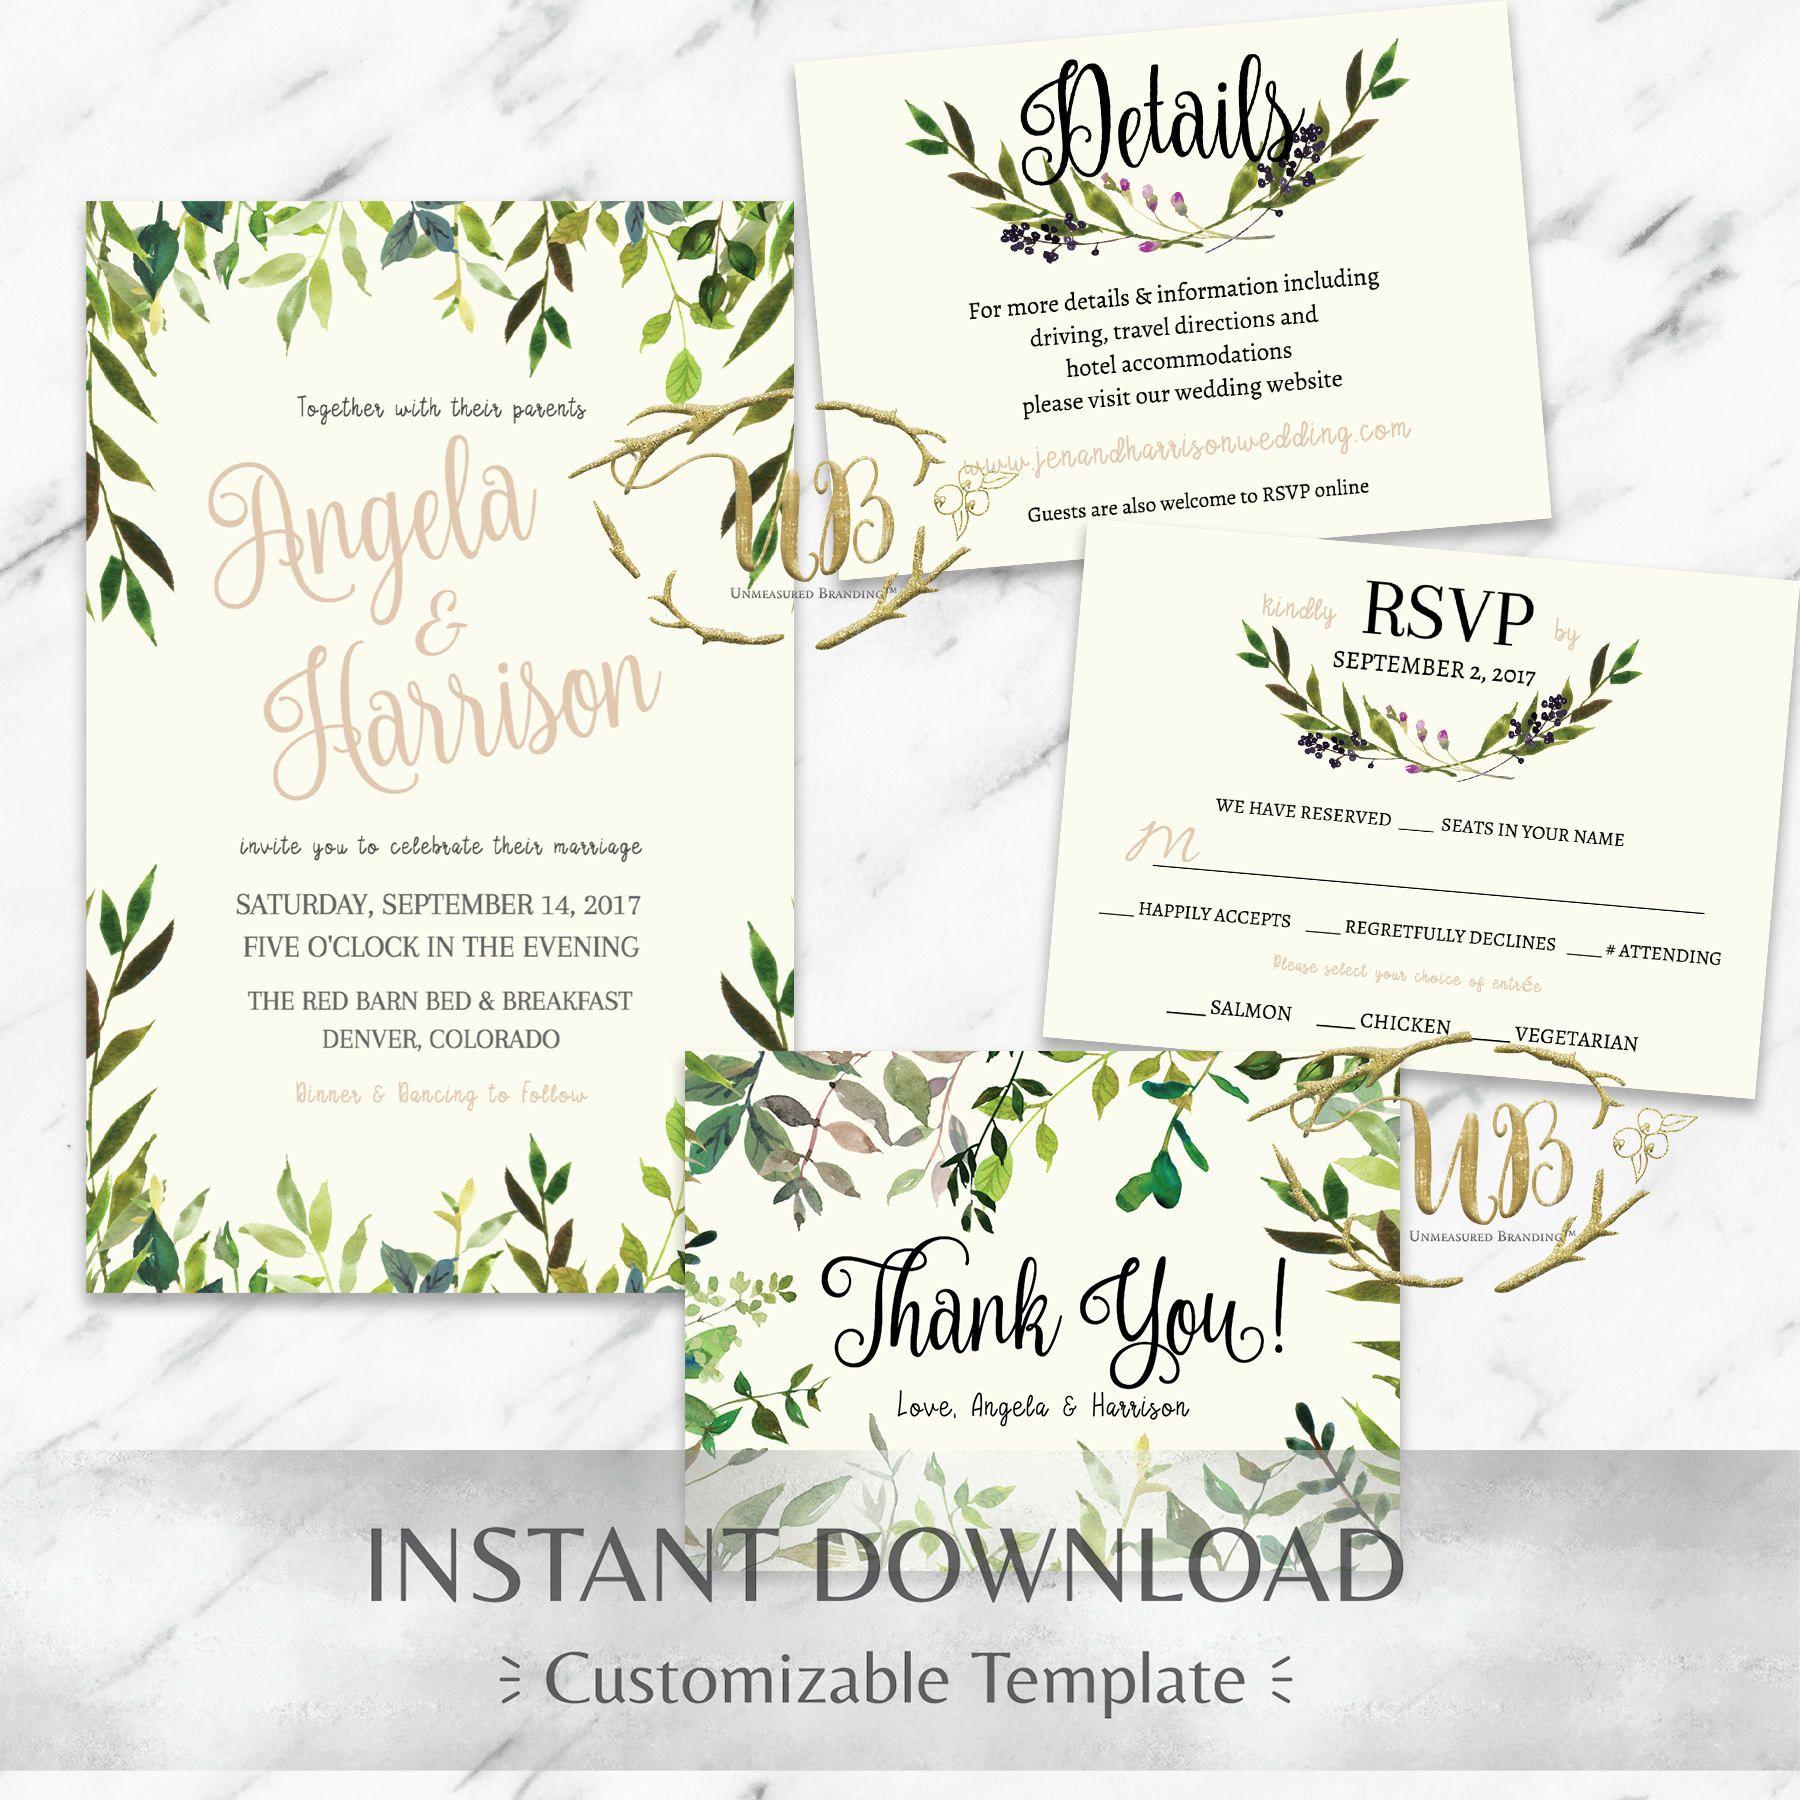 Botanical Wedding Invitation Suite Greenery Wedding Invitation - Wedding invitation templates: hotel accommodations template for wedding invitations